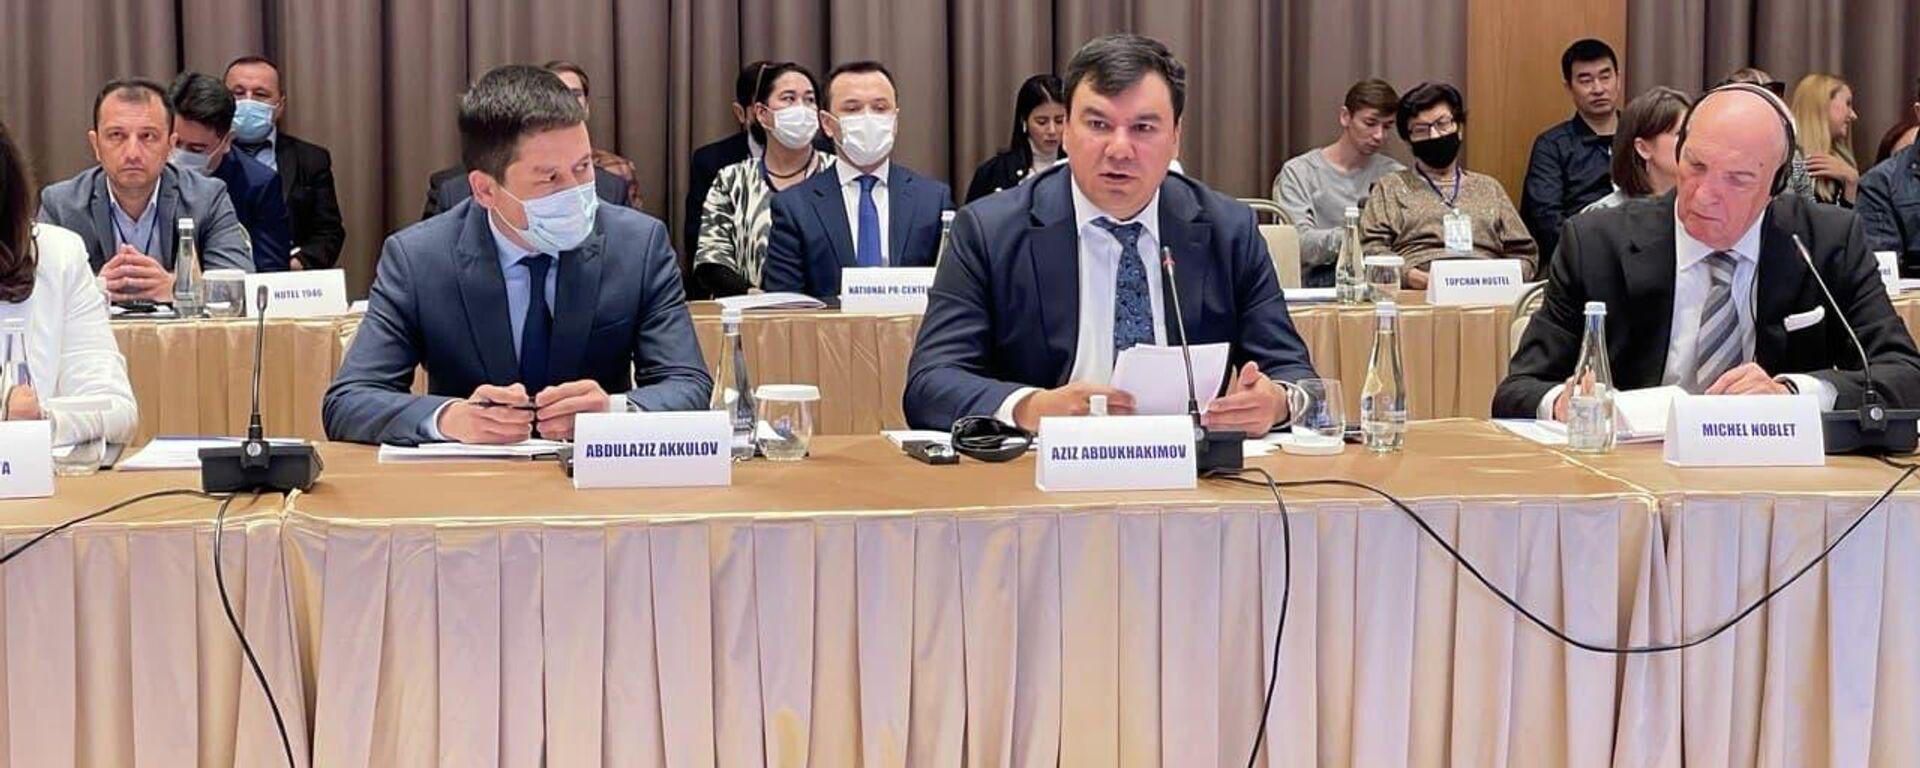 В Ташкенте начался Хотел бизнес форум  - Sputnik Ўзбекистон, 1920, 30.03.2021